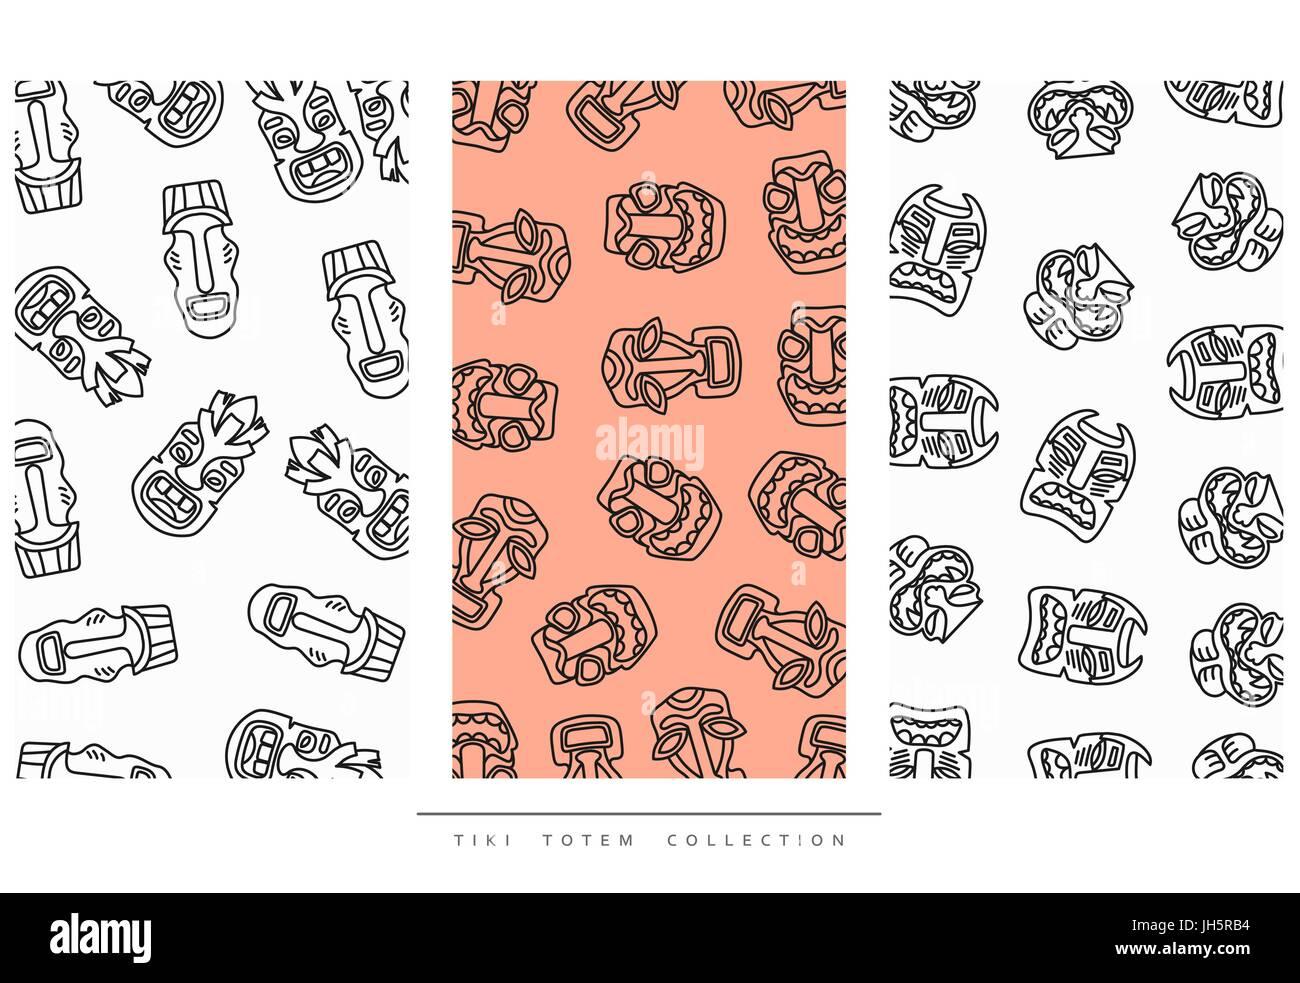 Pattern Tiki Totem in linear style vector illustration - Stock Vector